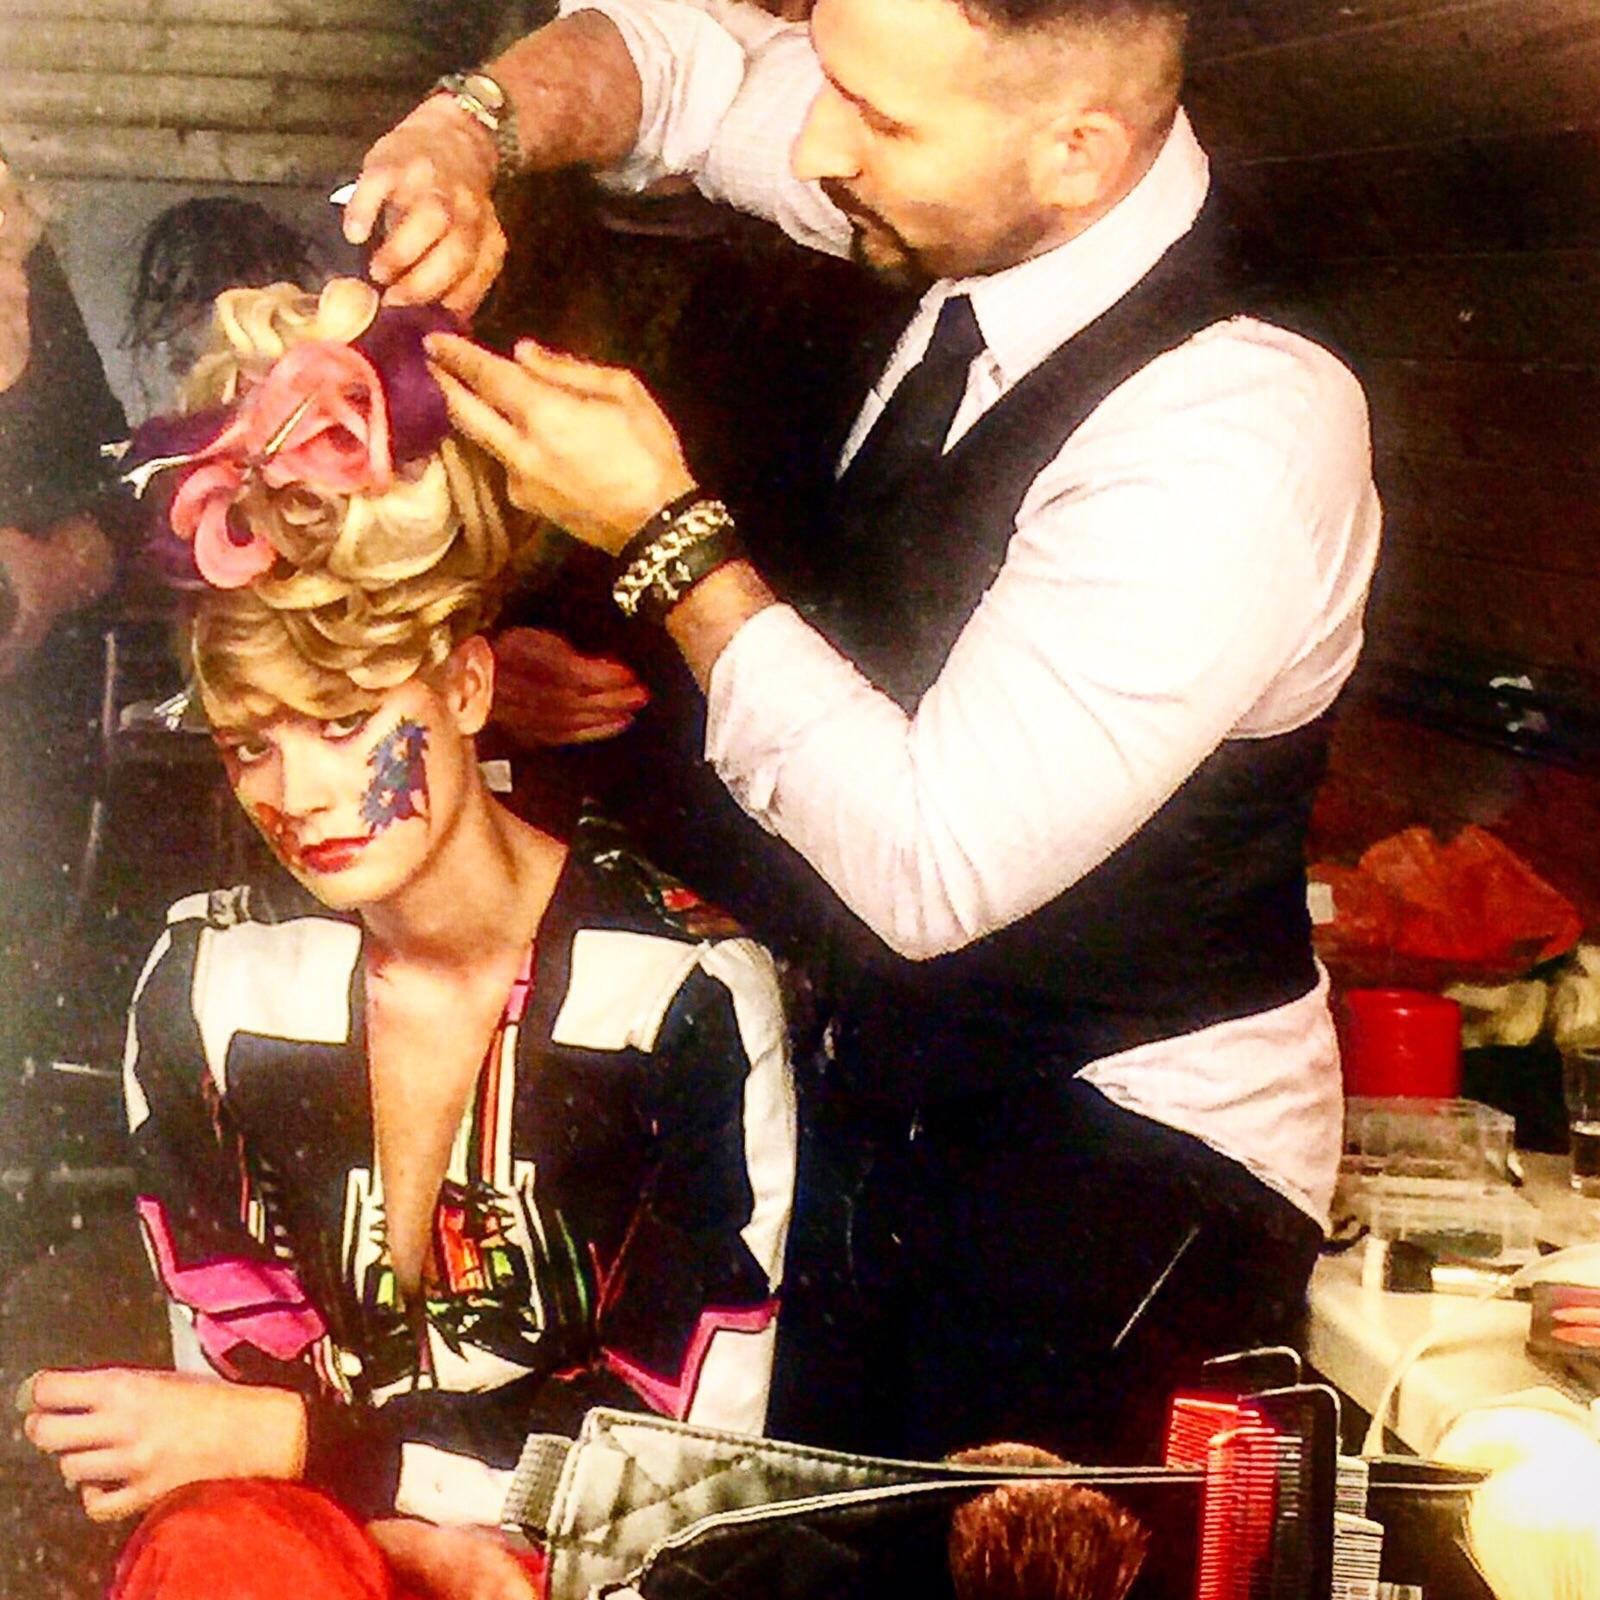 Joseph Koniak working on session hair